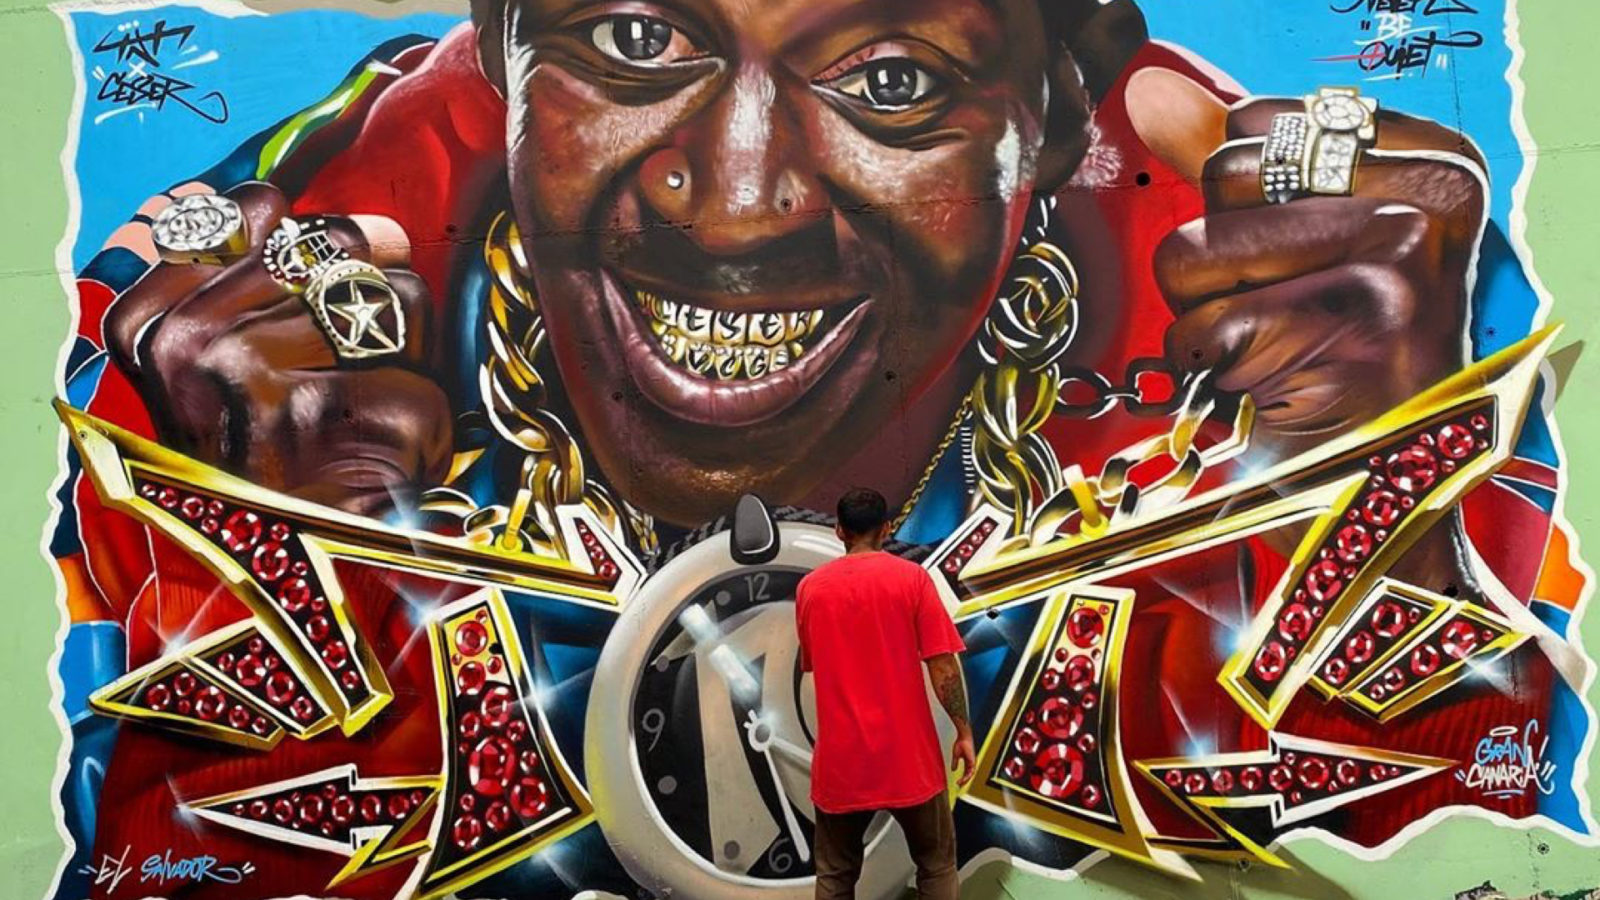 Graffiti Kings Ceser VCG interview